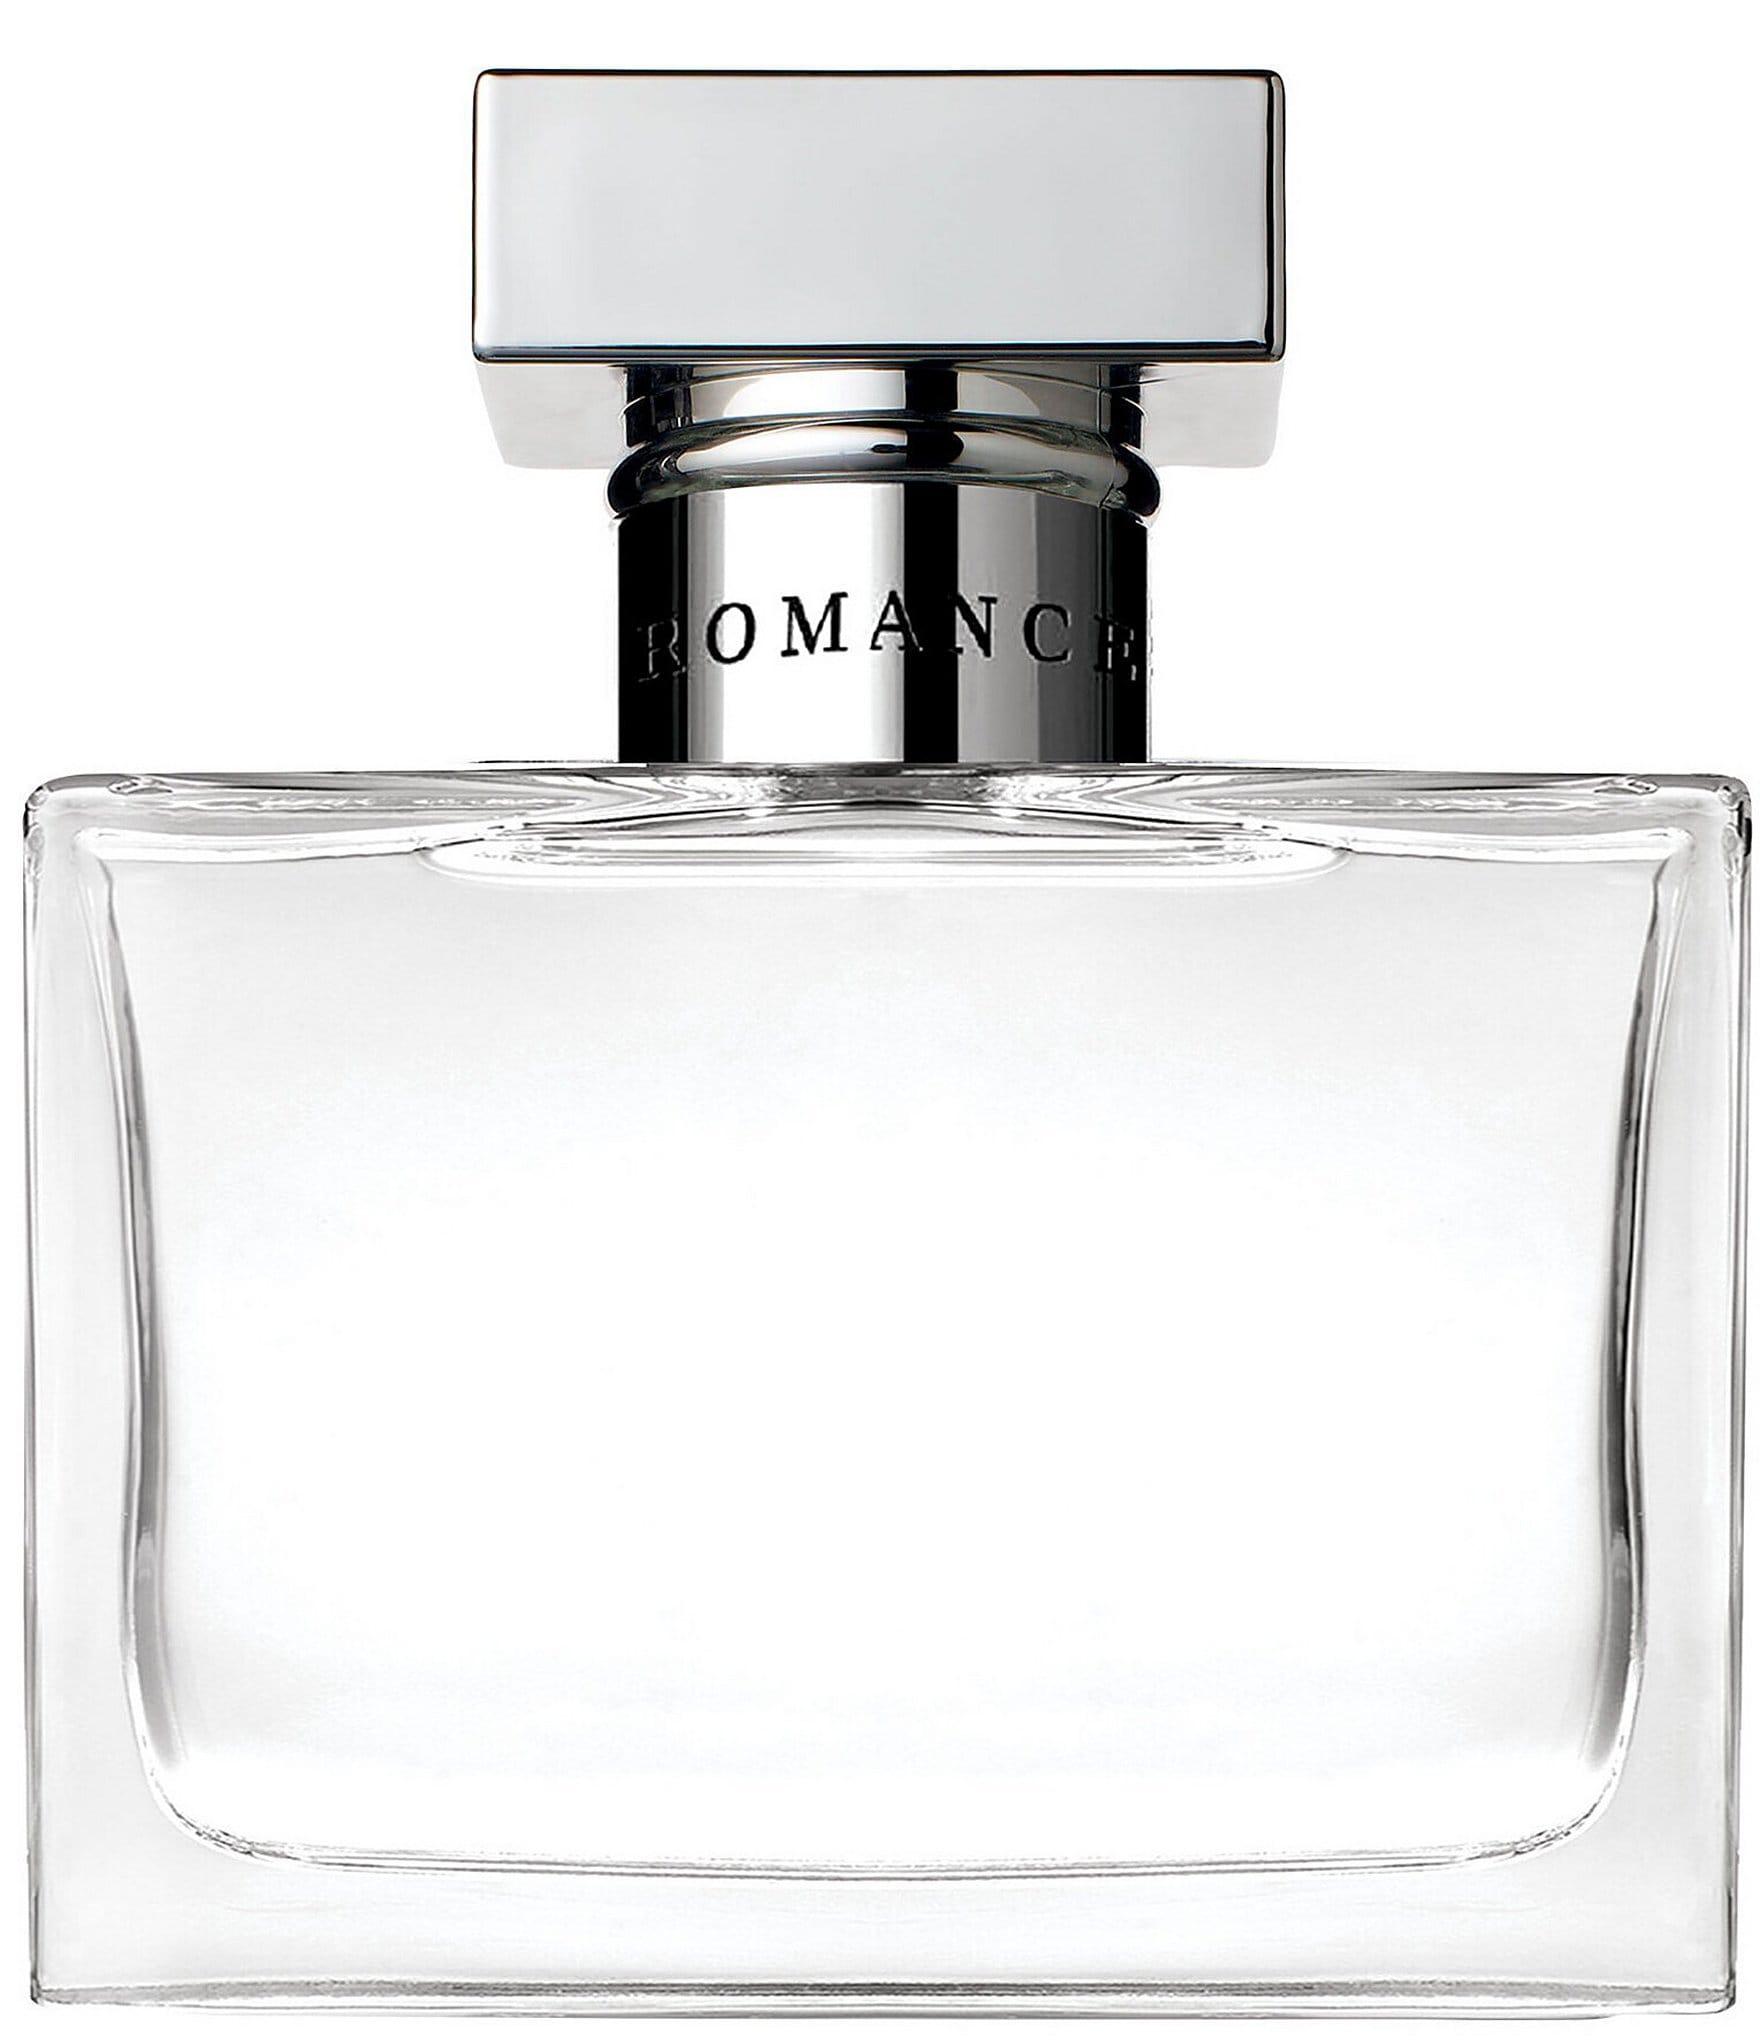 e20e2068689f5 Ralph Lauren Romance Eau de Parfum Spray